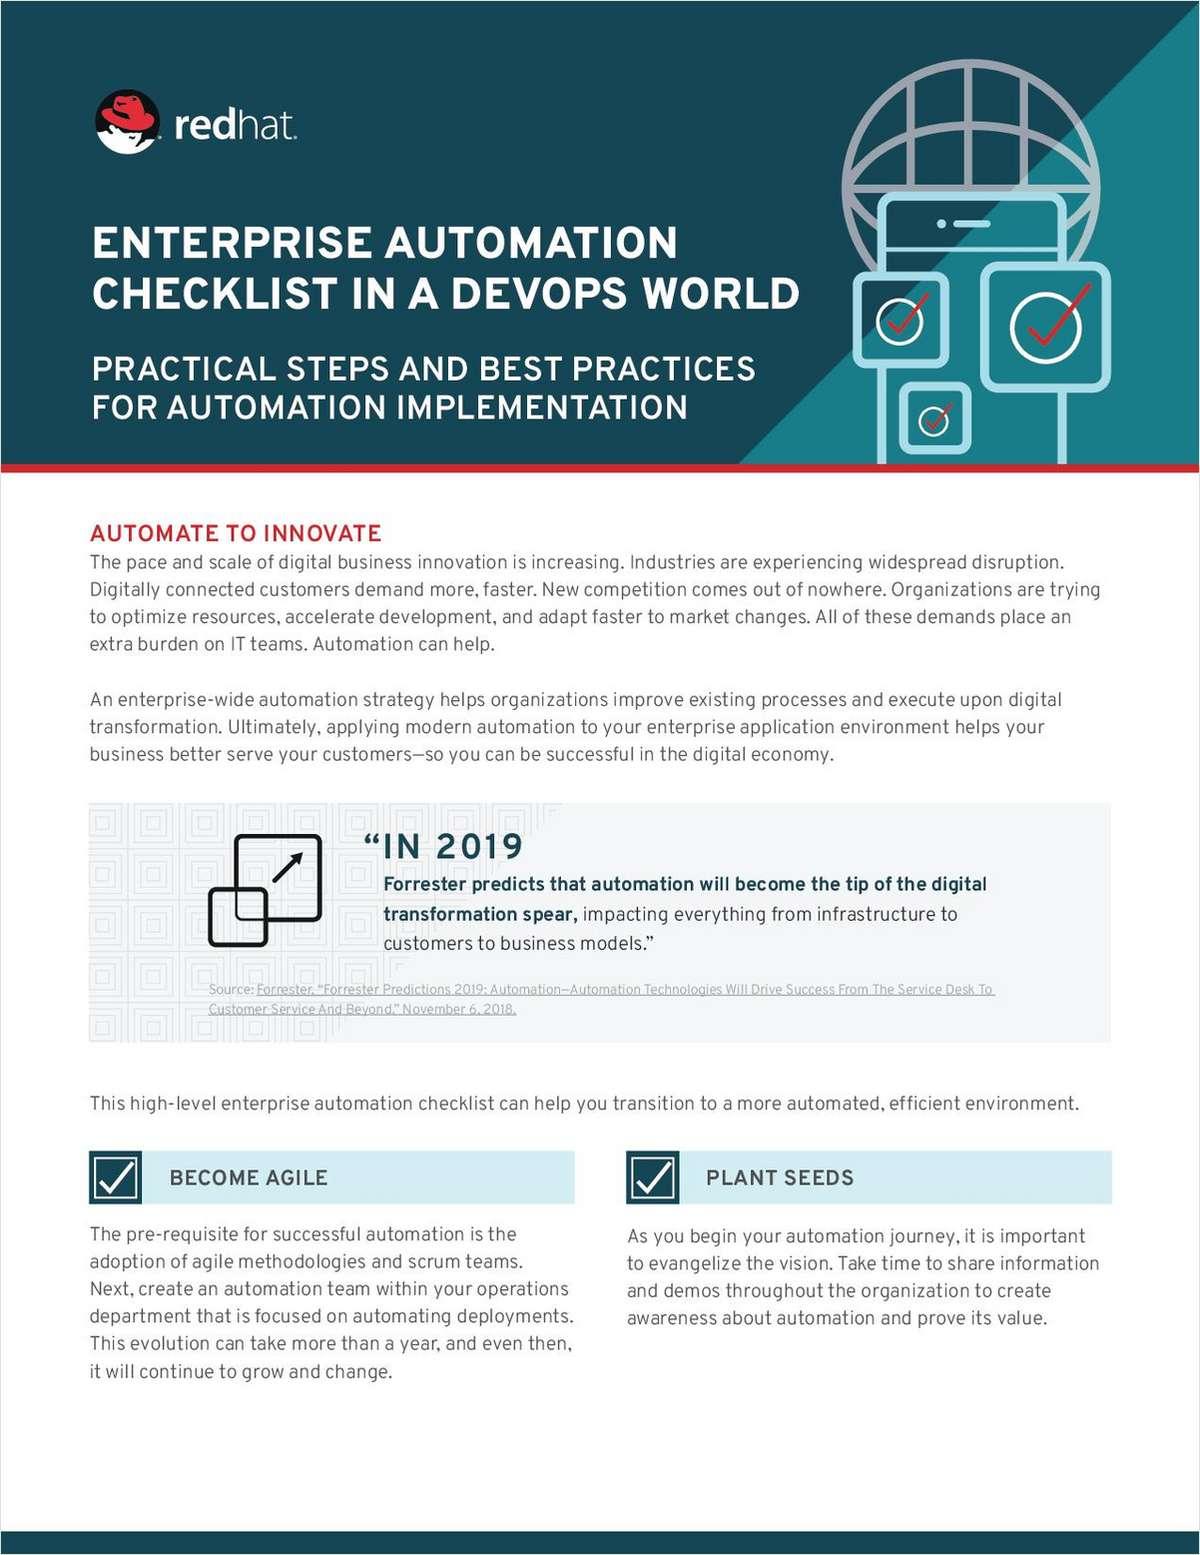 Enteprise Automation Checklist In A DevOps World, Free Red